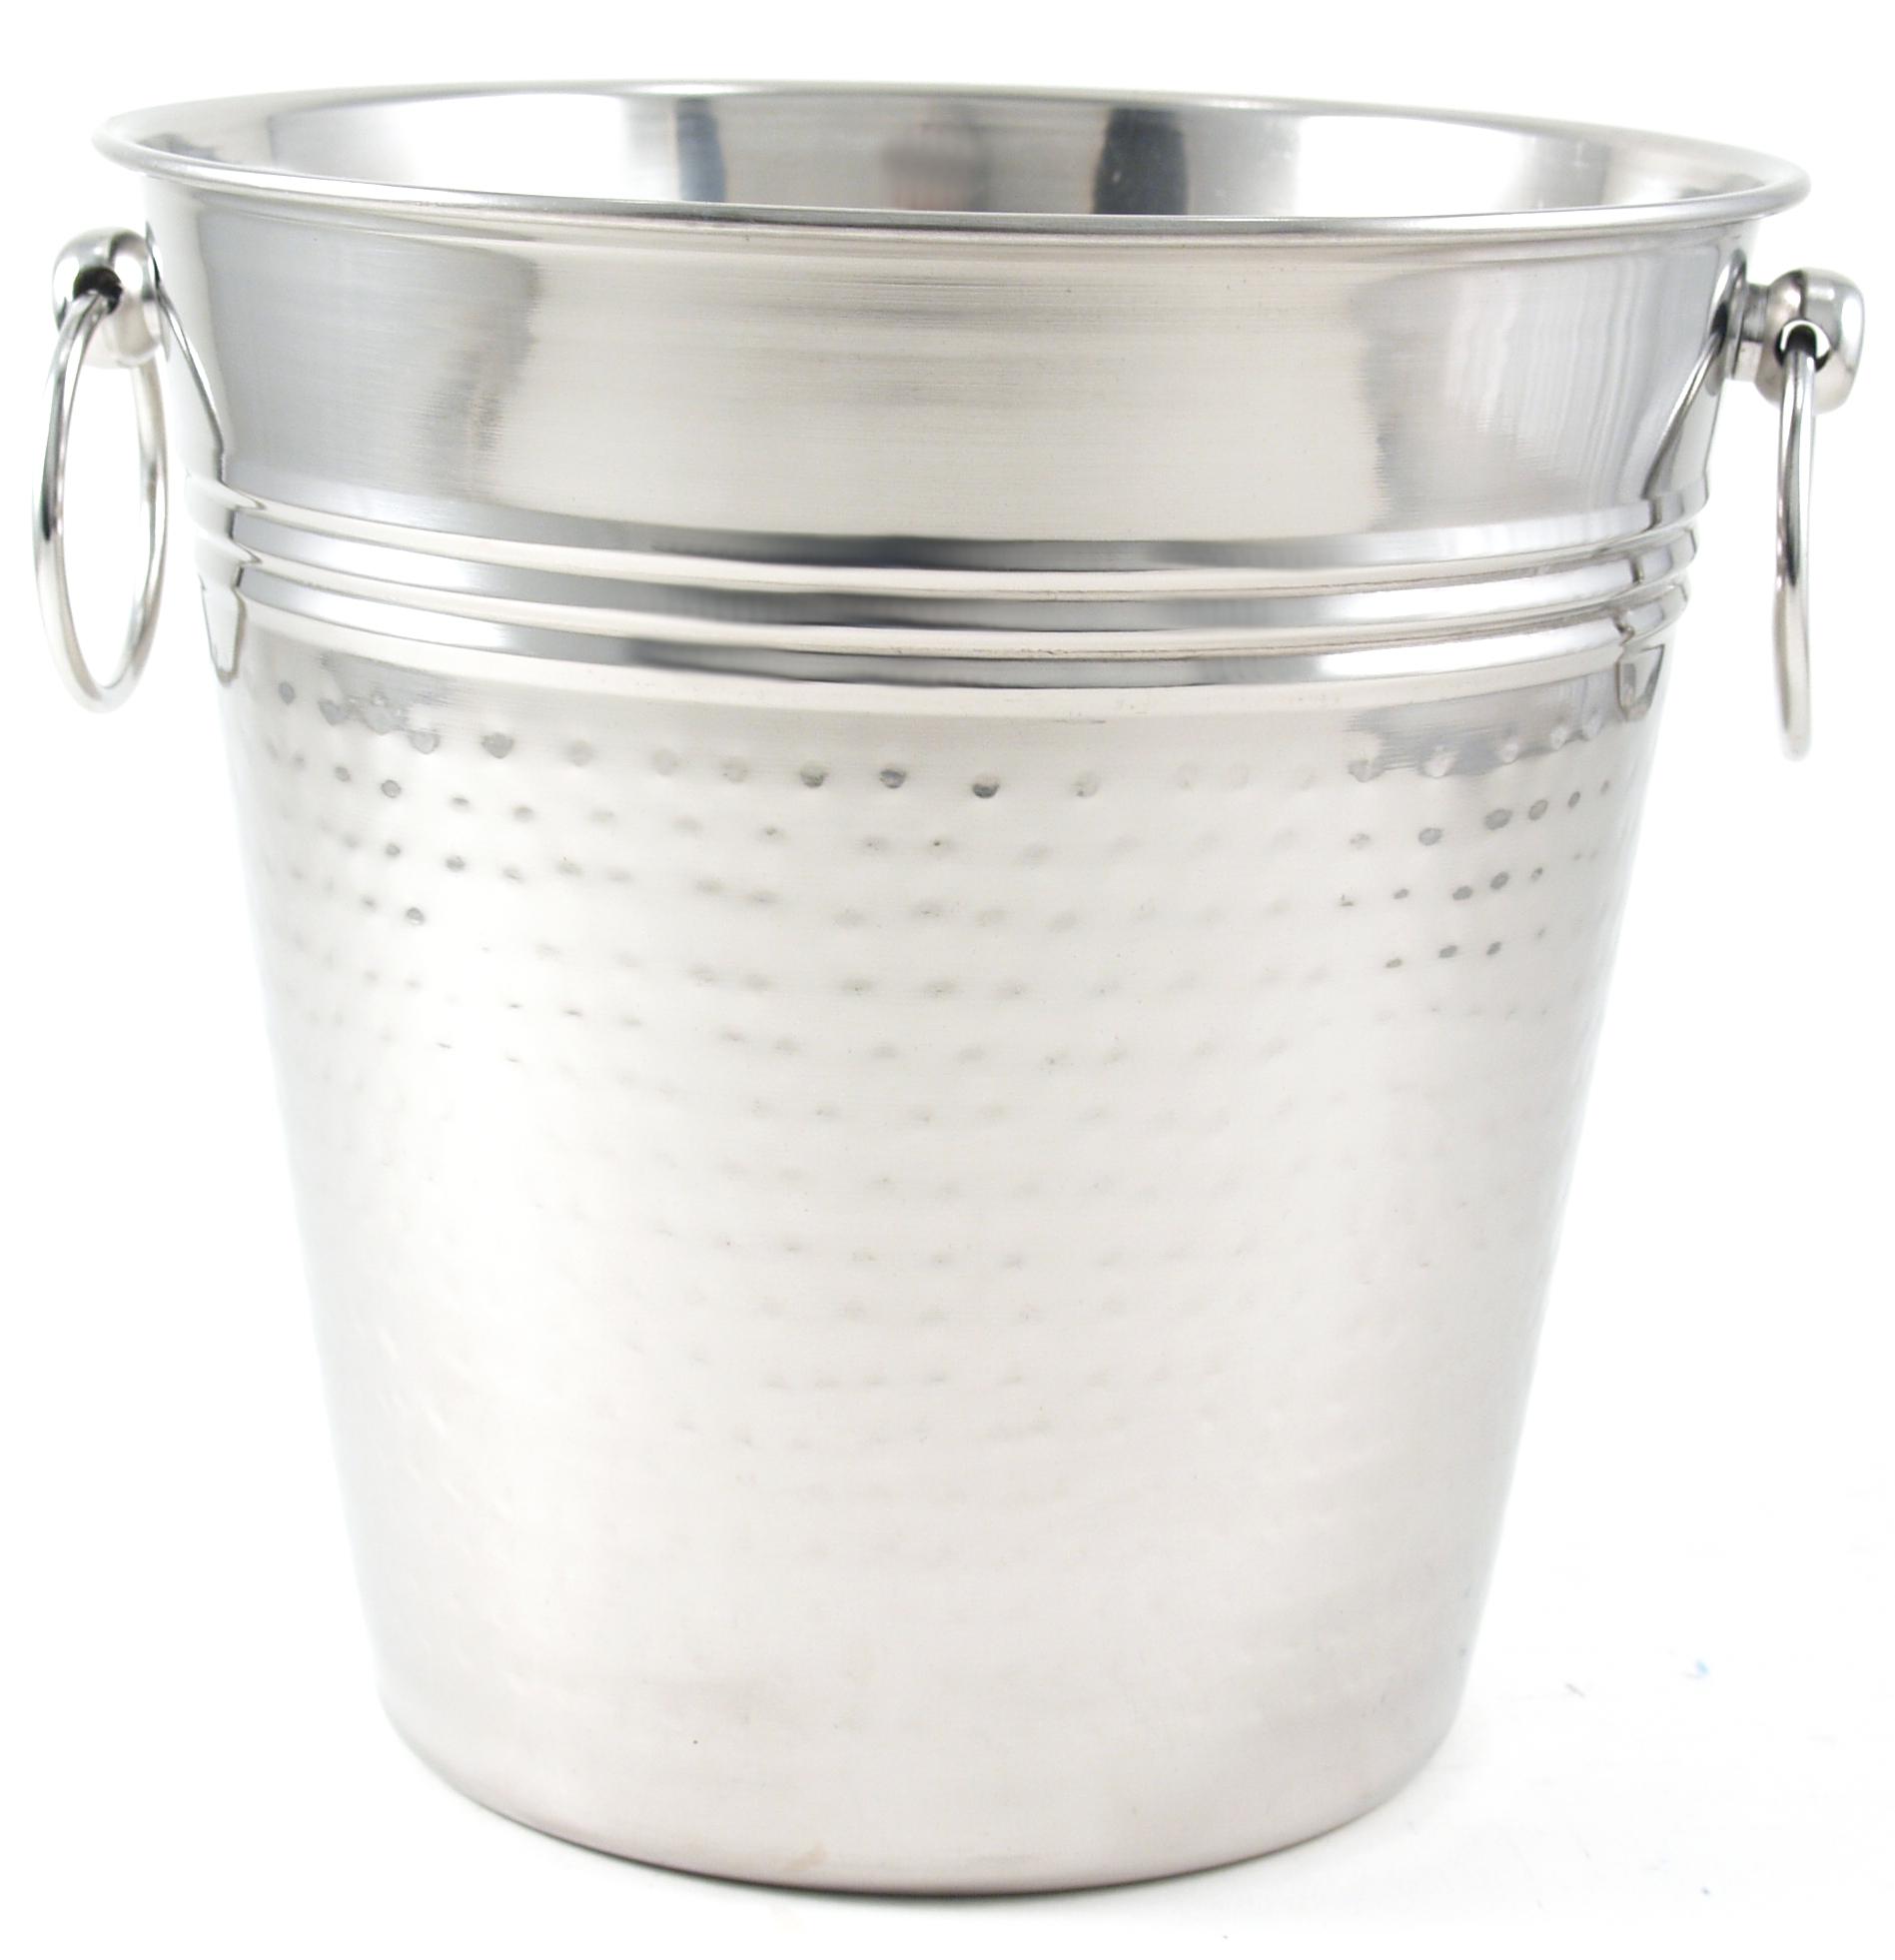 Grant Howard Hammered Stainless Steel Wine Bucket, 5 Quart